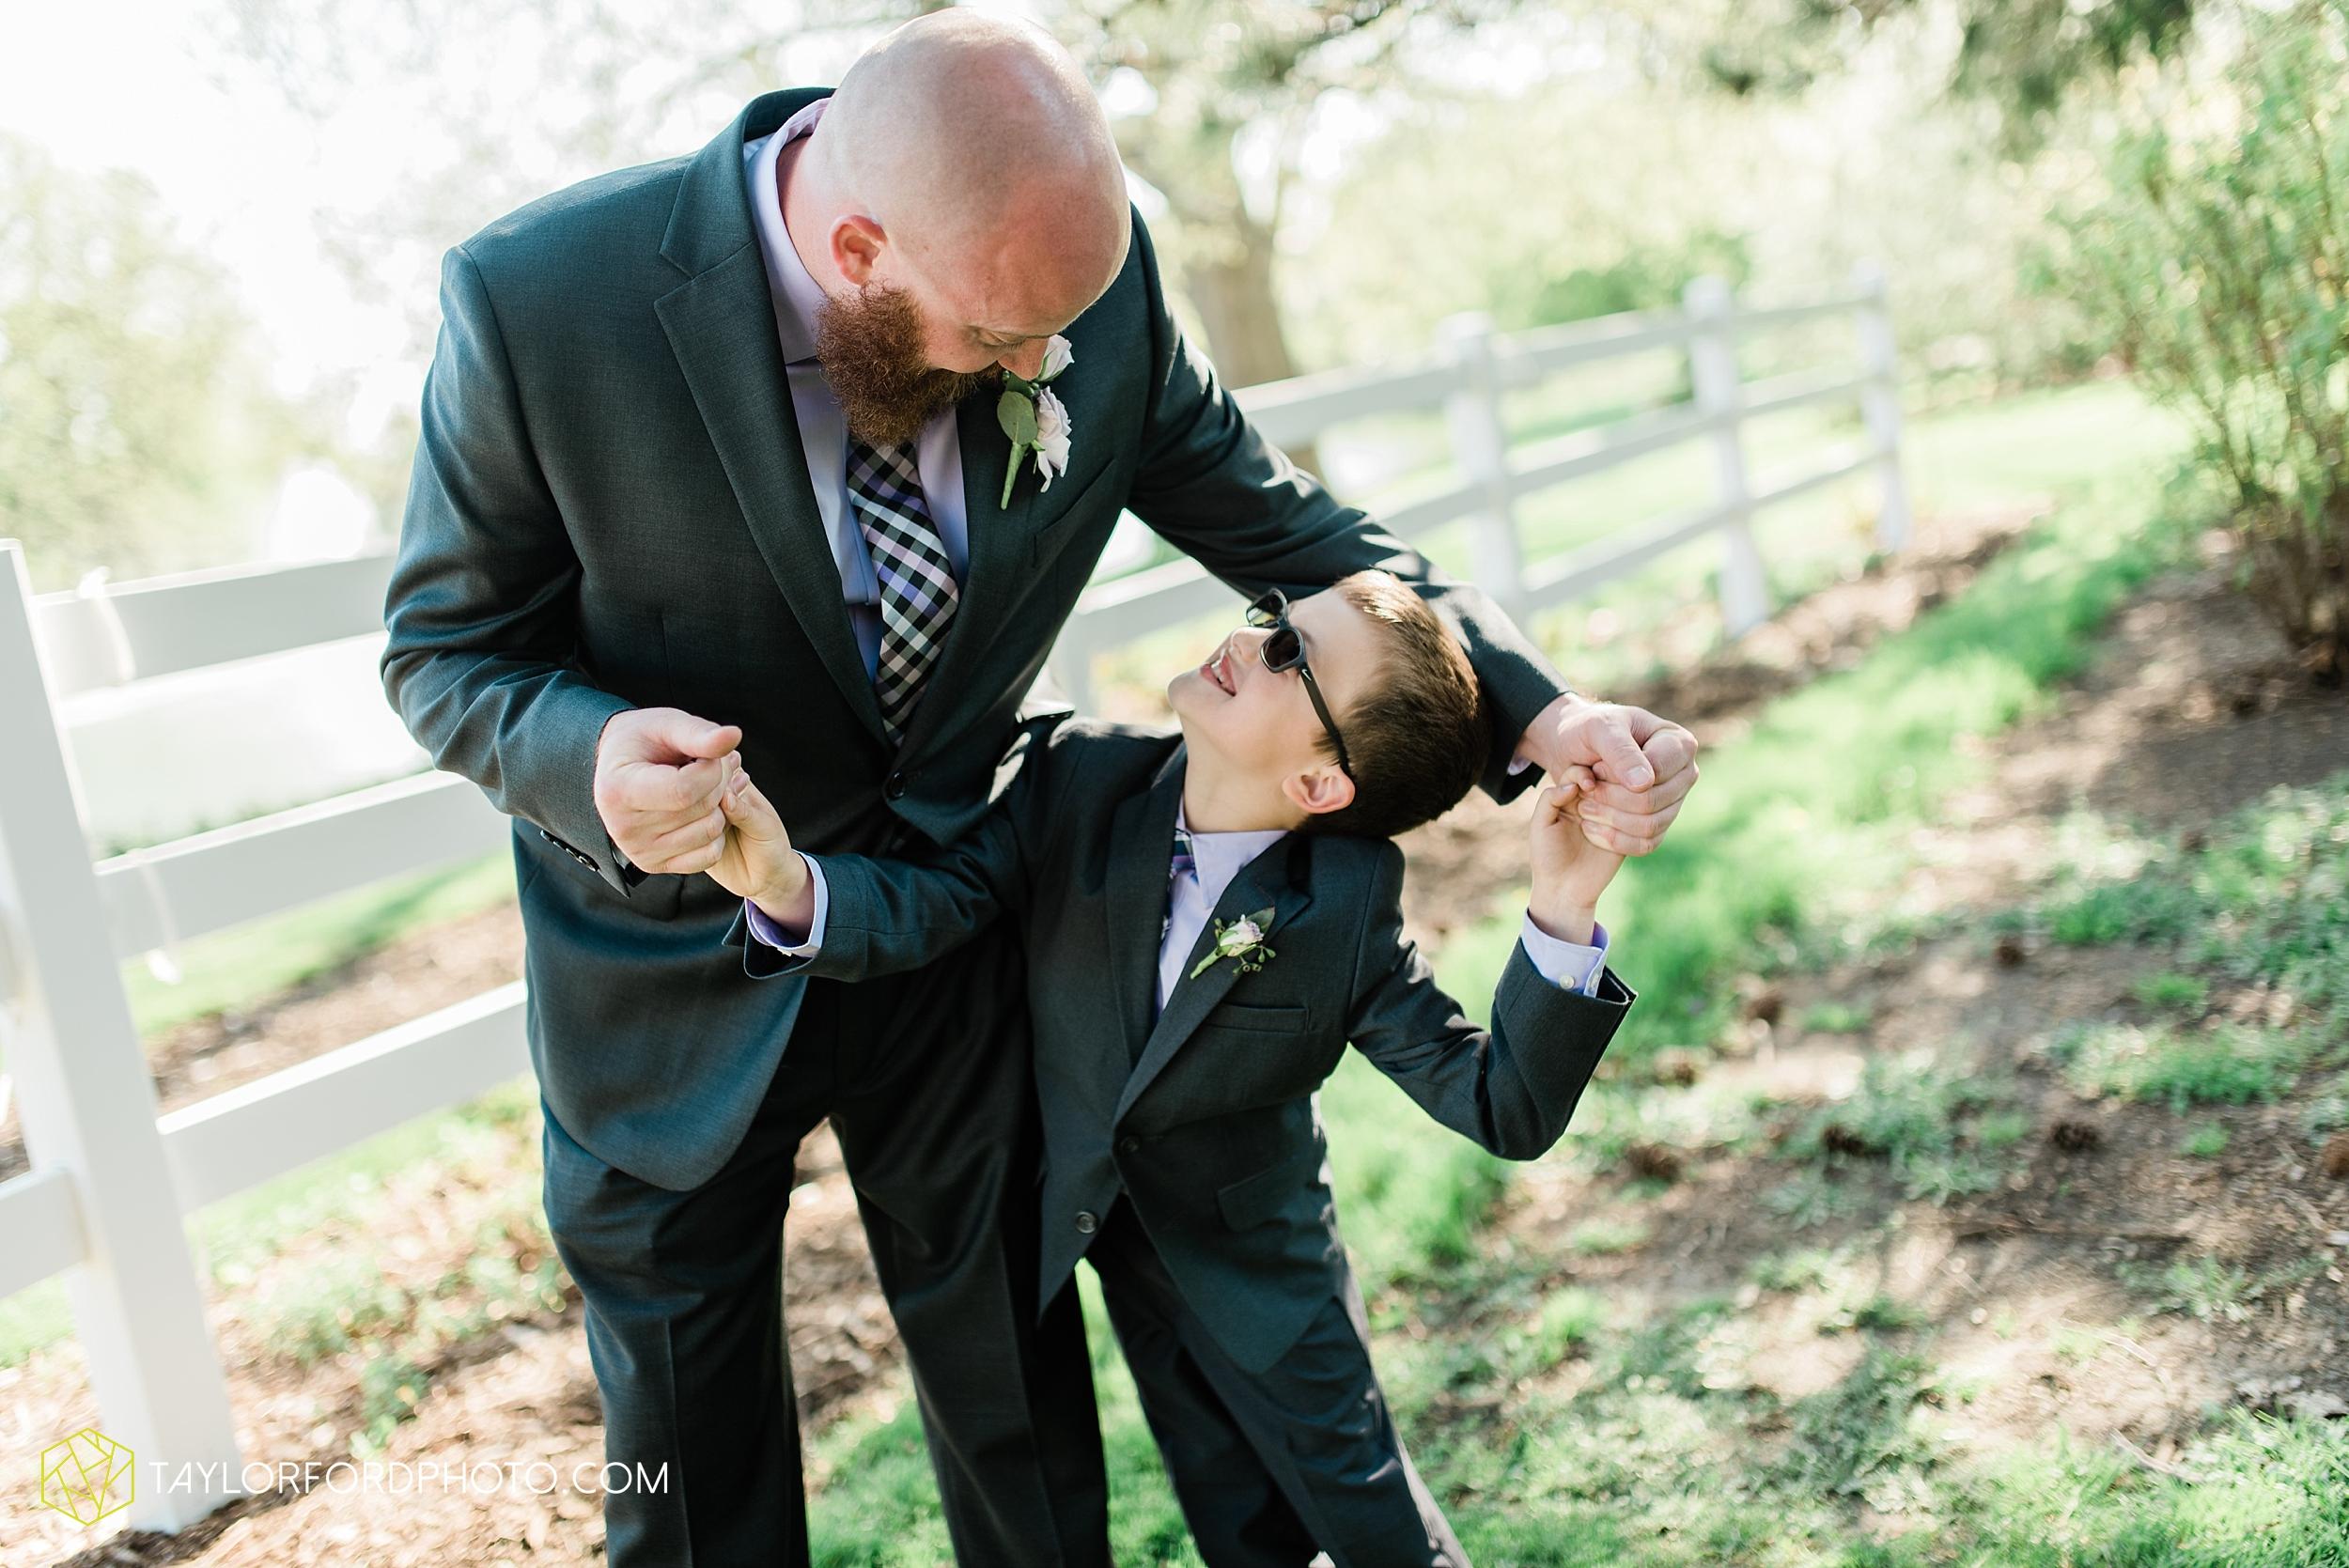 lakeside-rose-gardens-fort-wayne-indiana-elopement-wedding-photographer-Taylor-Ford-Photography_7186.jpg